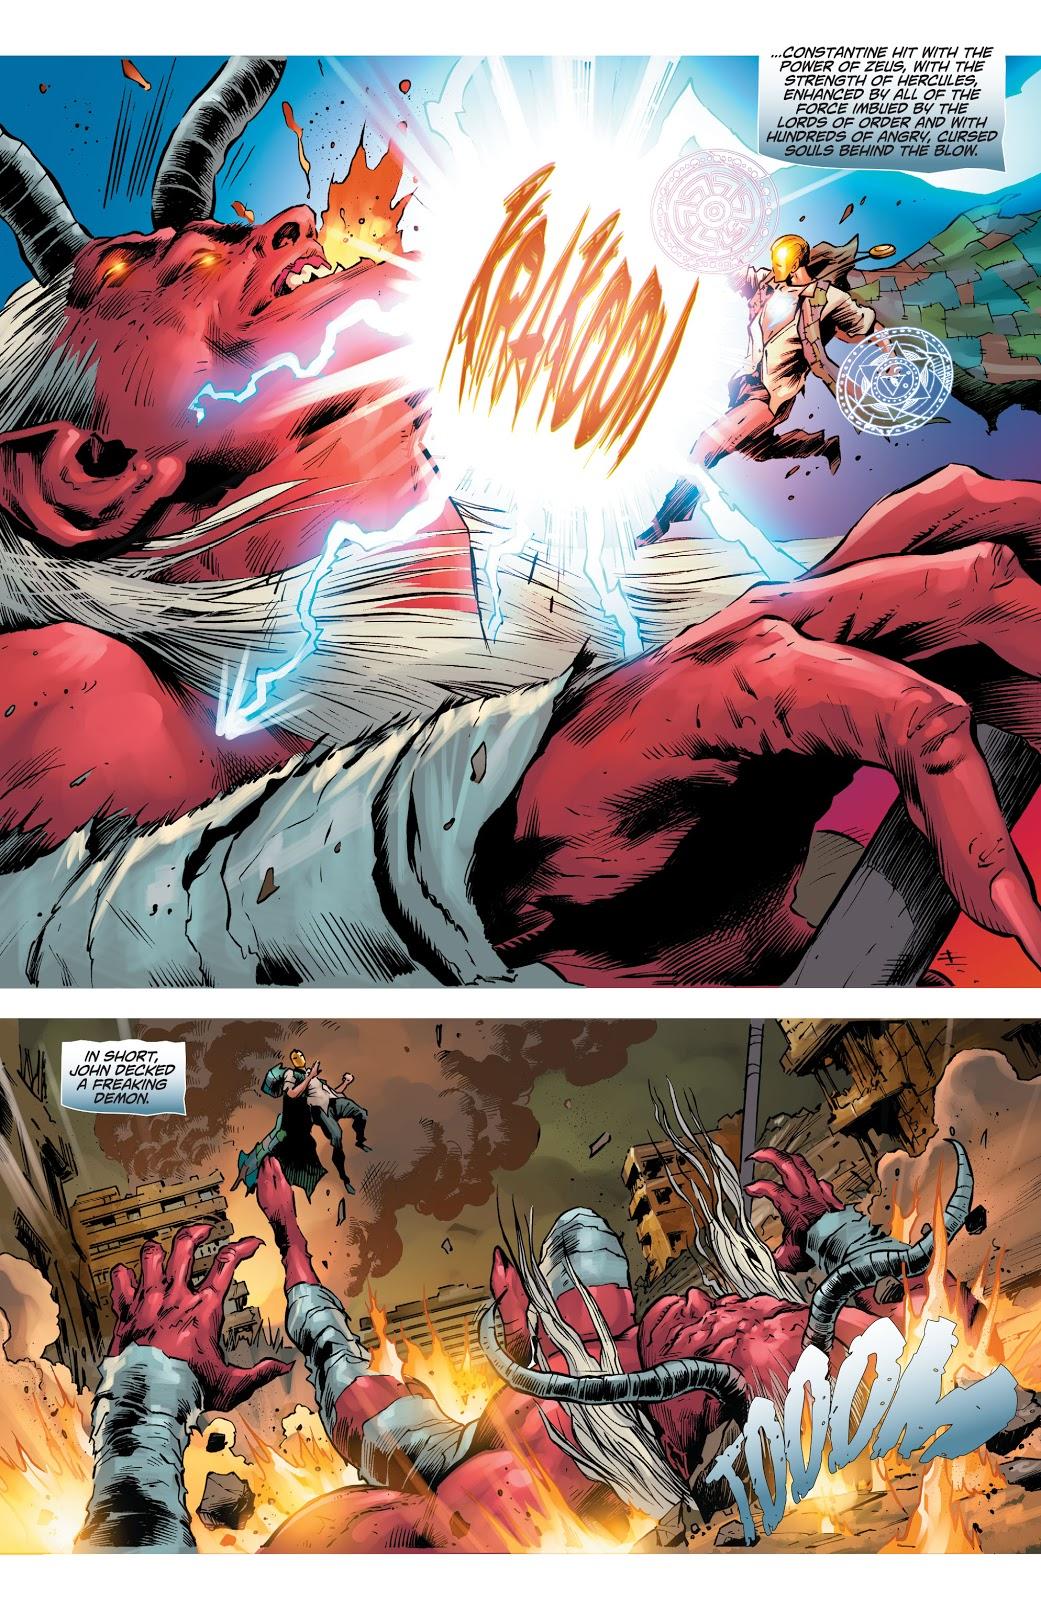 John Constantine Kills Trigon (DCeased)